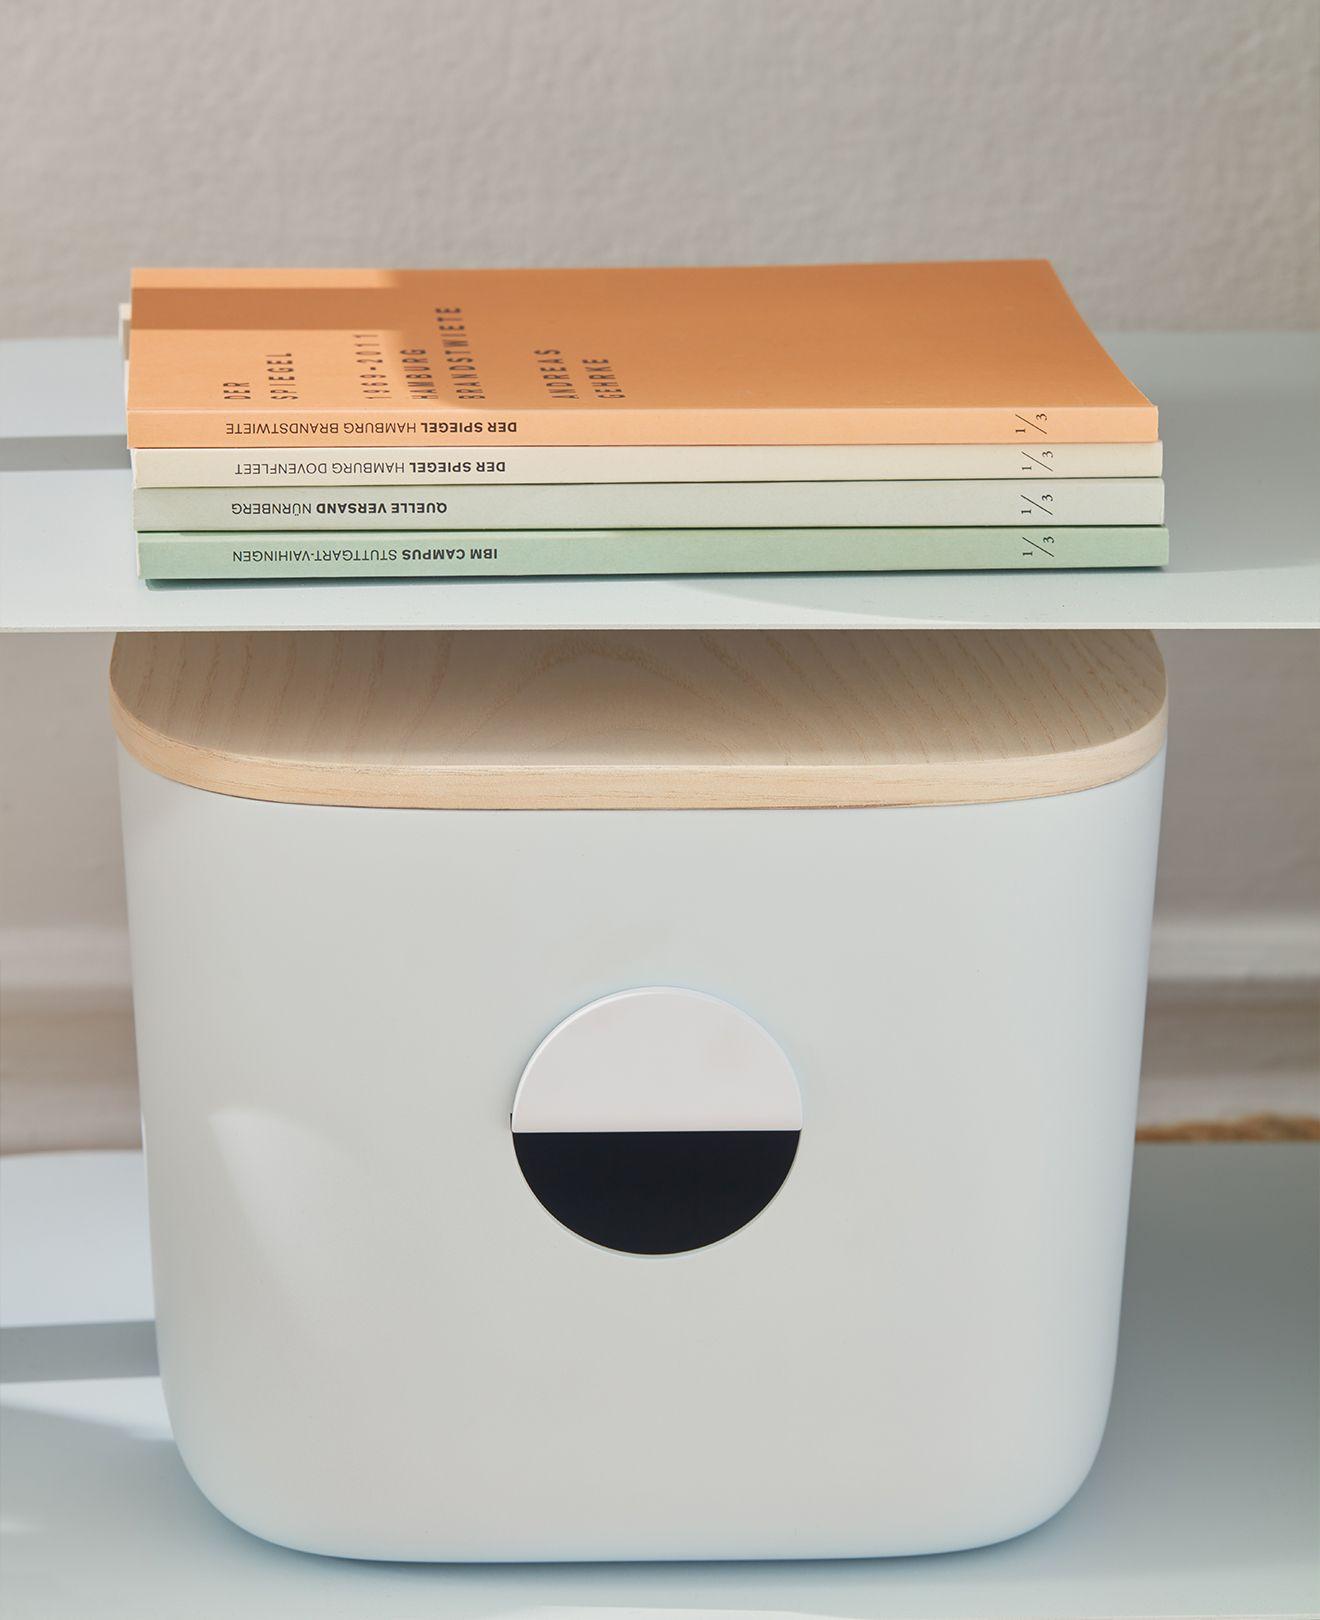 5050 Card - Medium Storage Bins - Responsibly Chosen Materials - Desktop Image